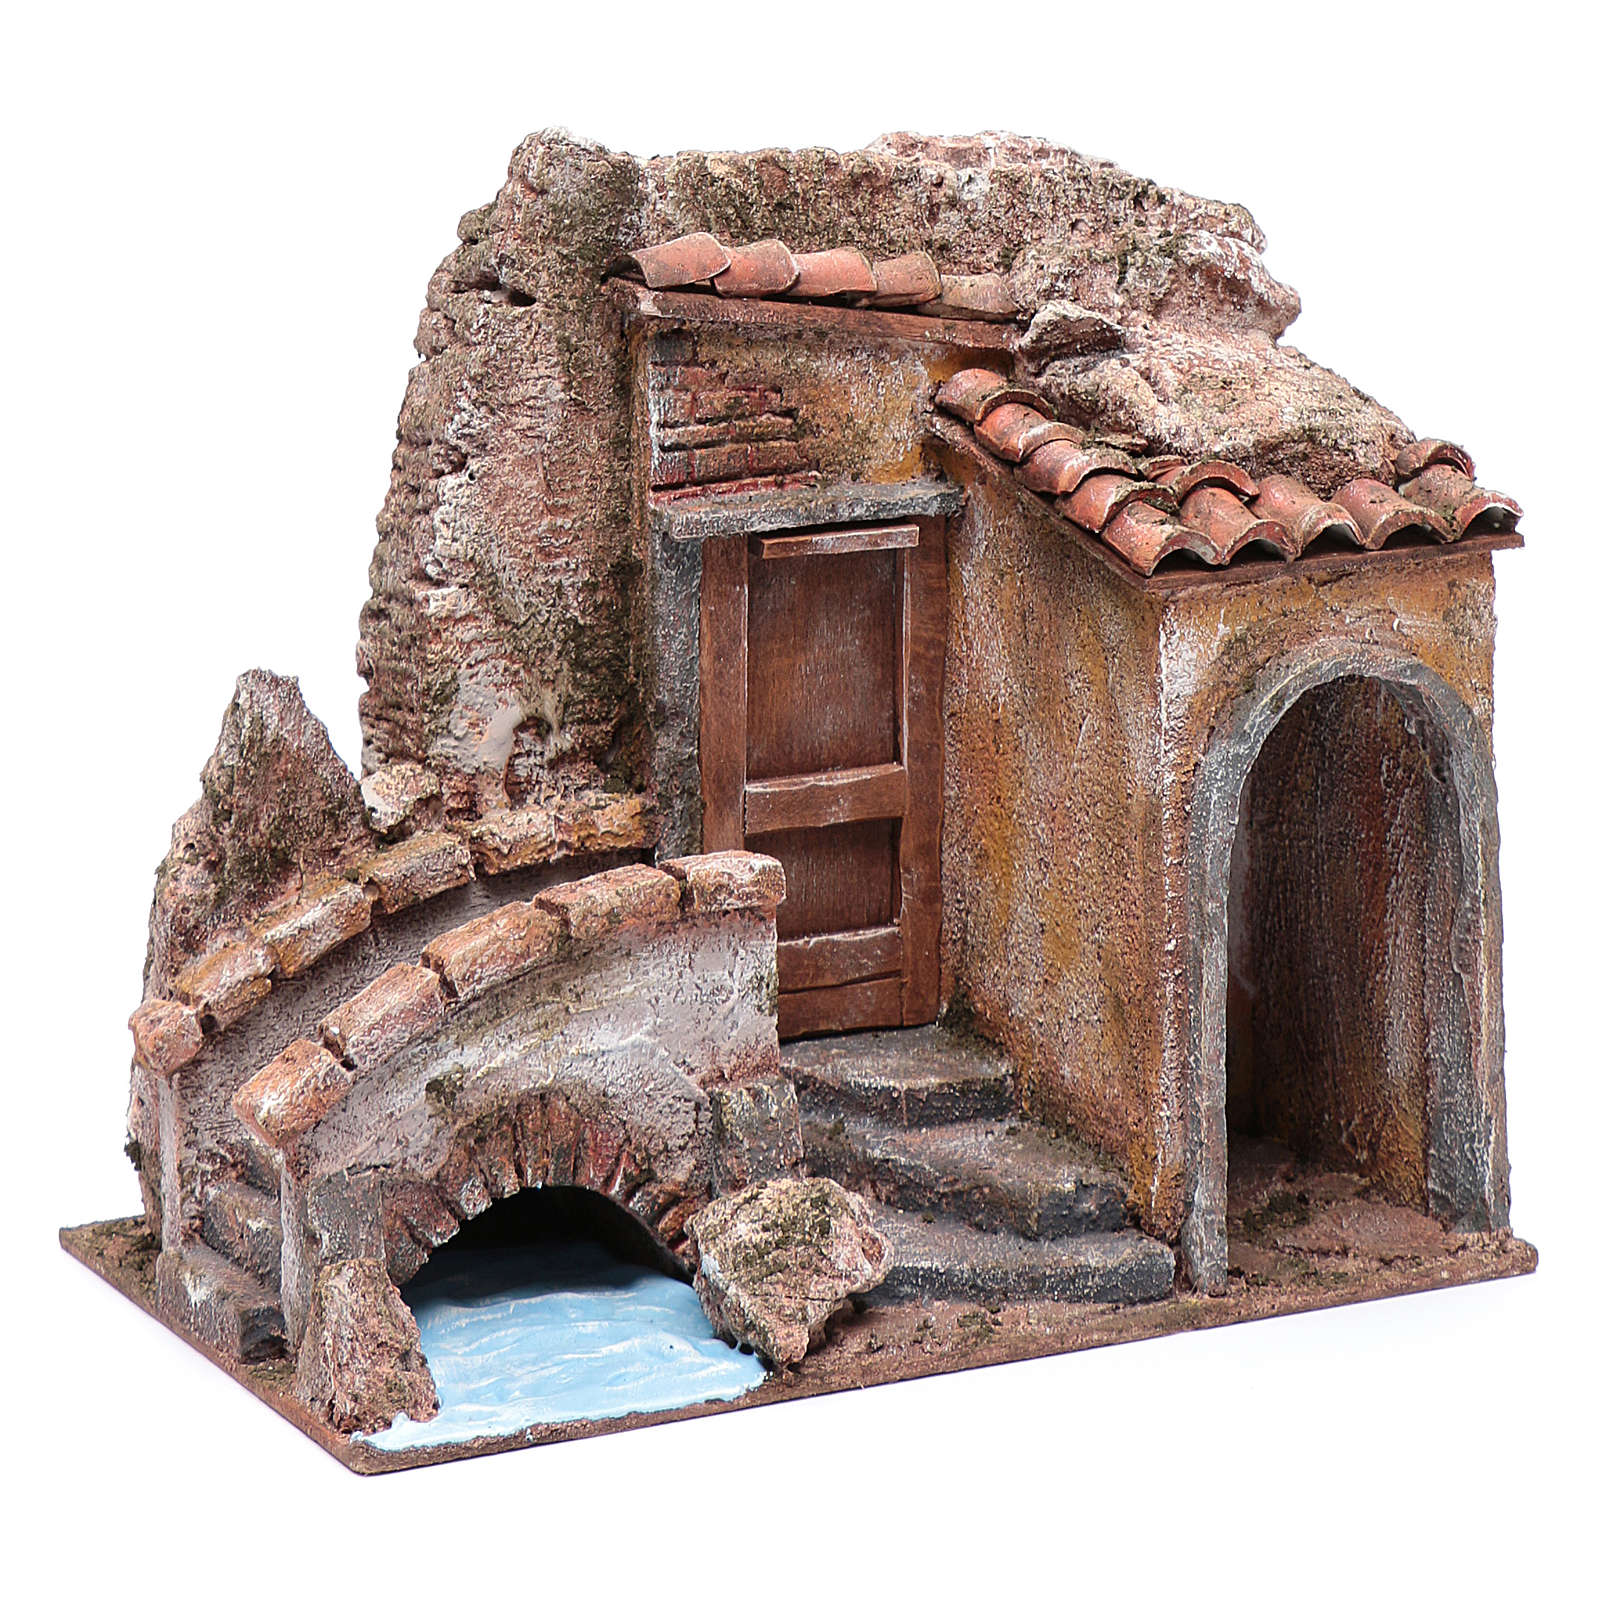 Little nativity scene house with bridge on river 20x25x15 cm 4